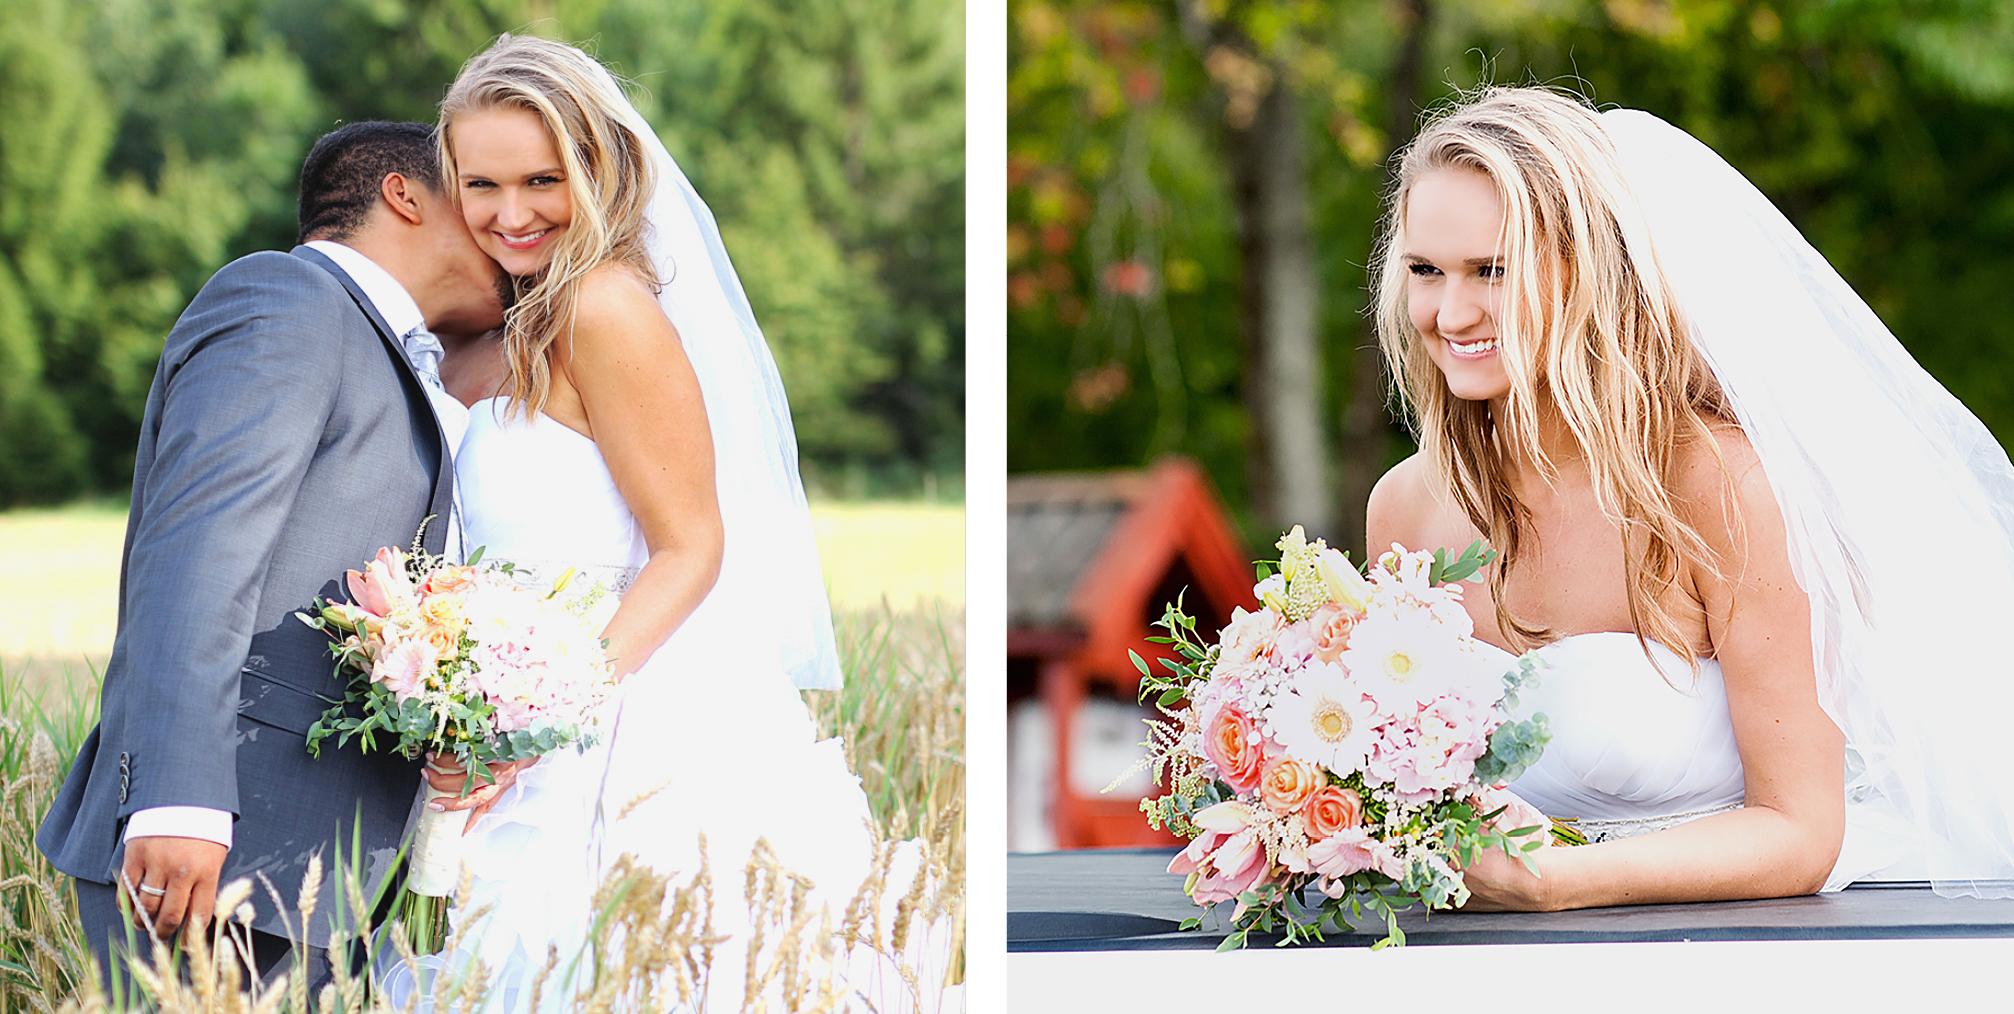 bryllupstips bryllupsplanlegging bryllupsblogg